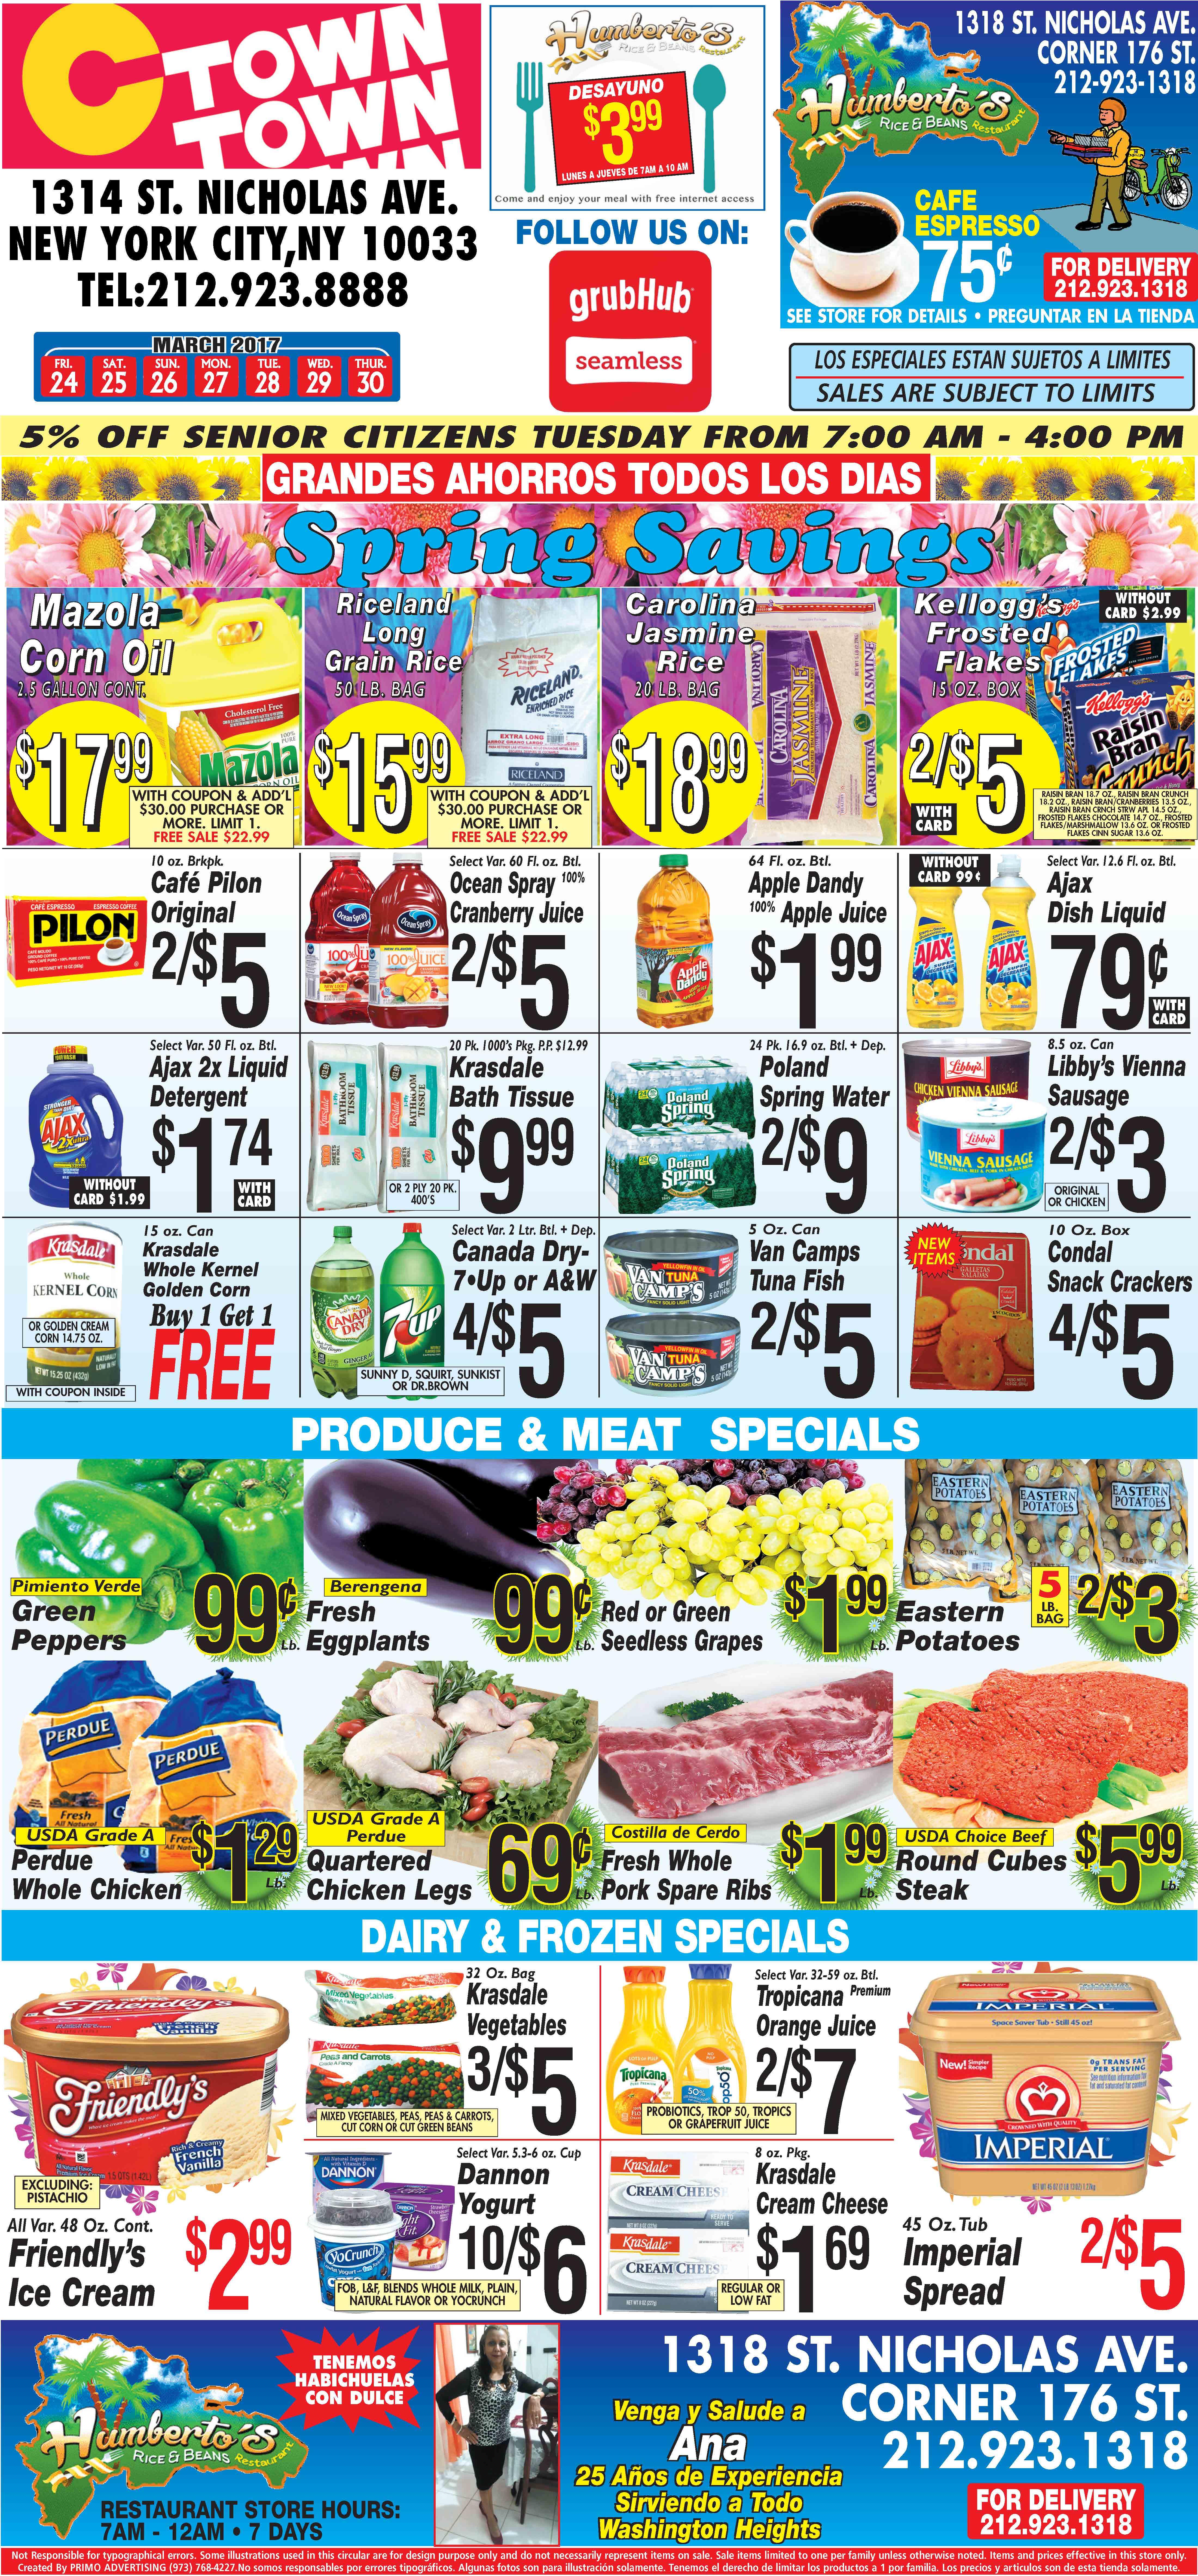 C-Town Supermarket image 0